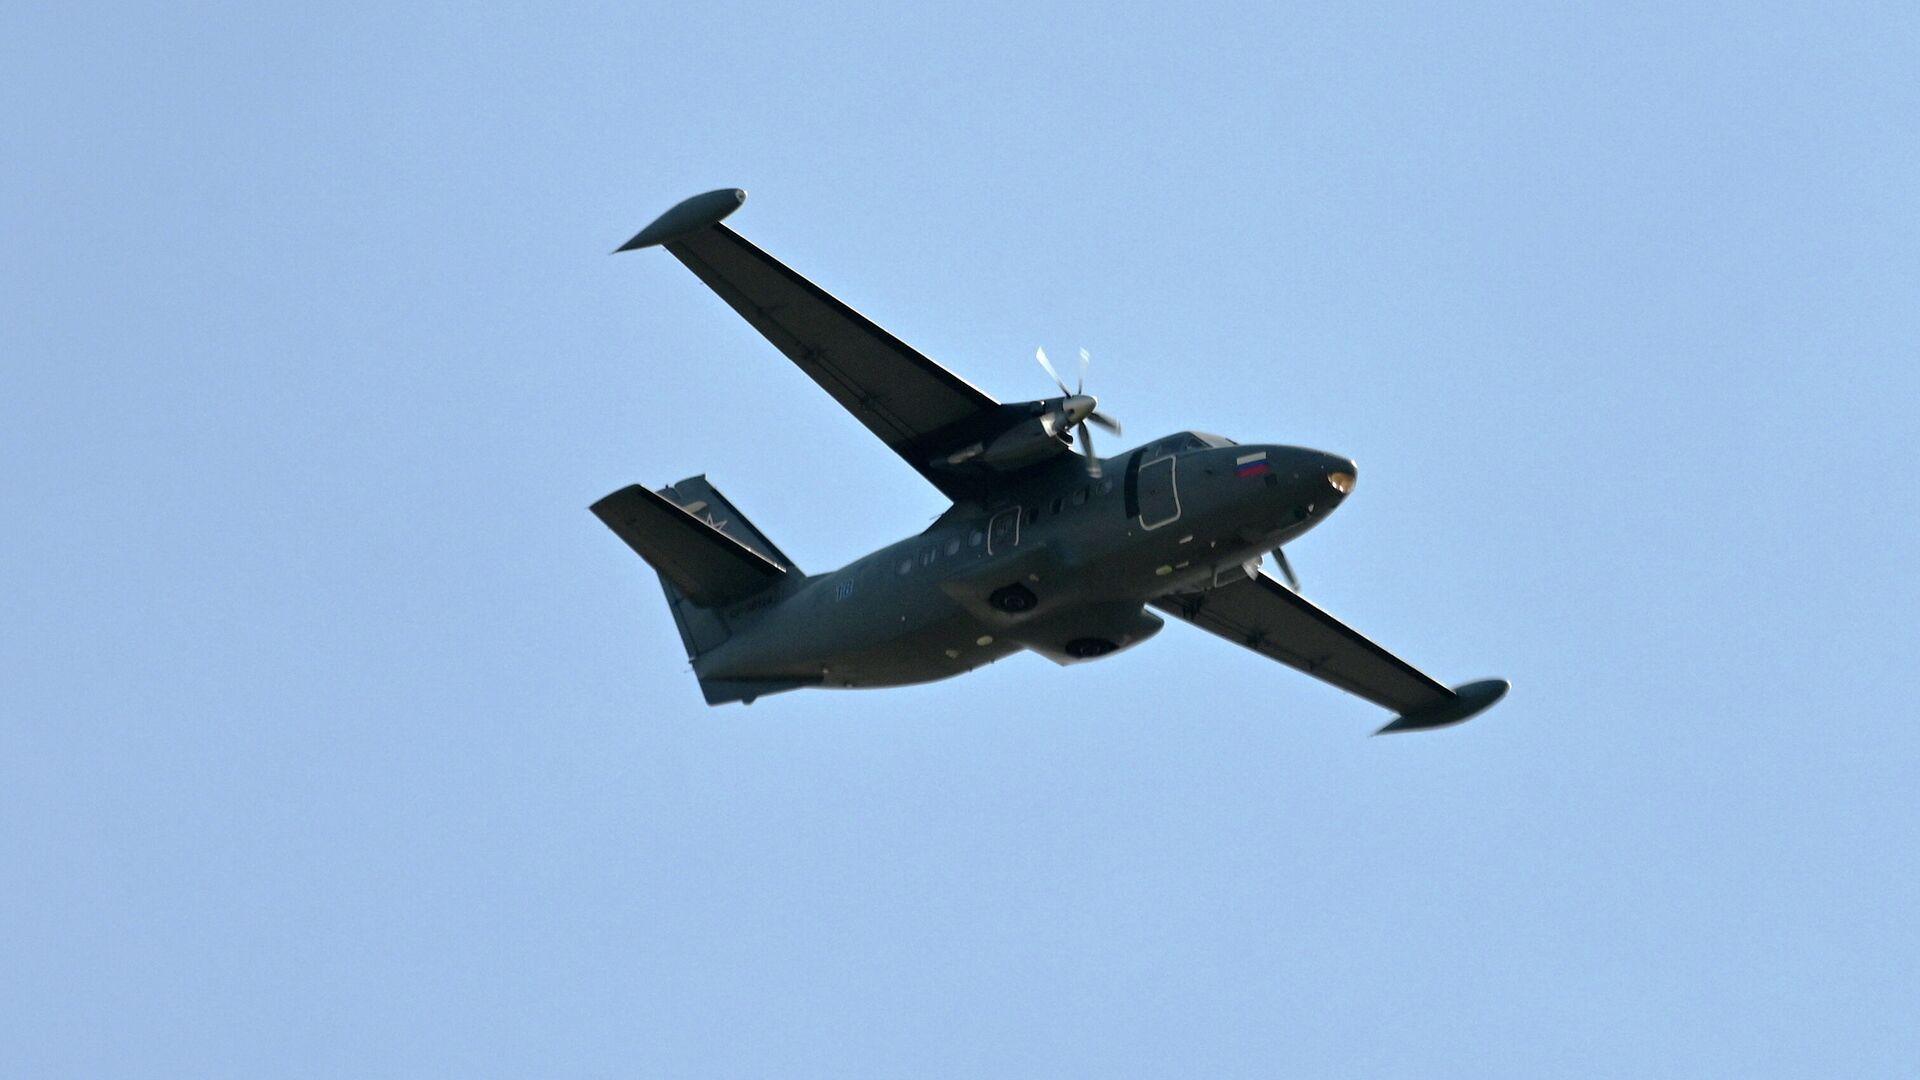 Самолет L-410 с парашютистами на борту потерпел крушение в Татарстане